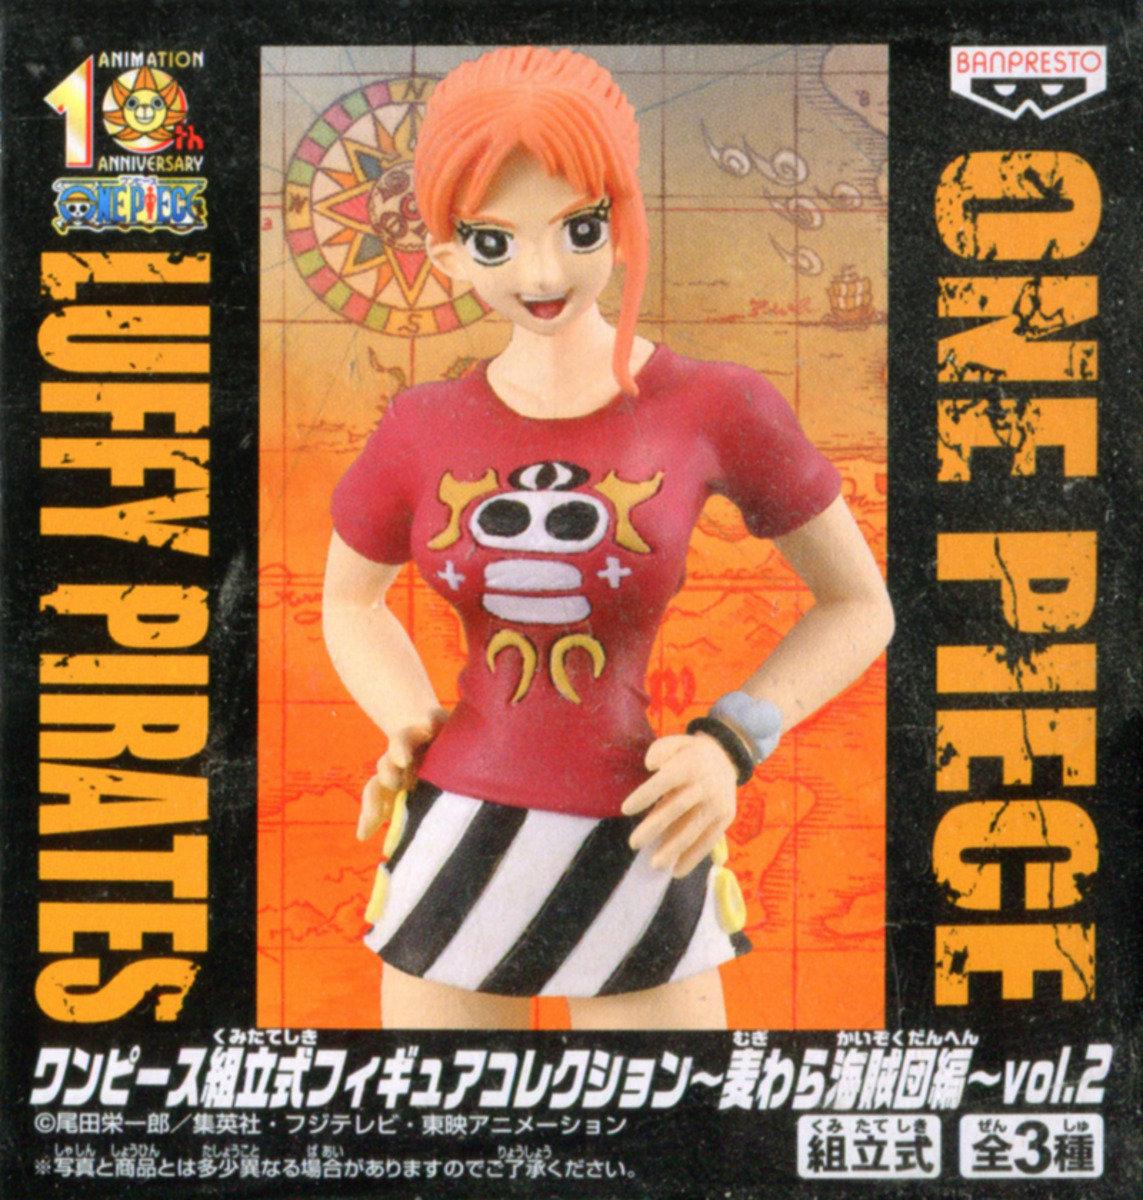 One Piece 海賊王 Figure Collection vol. 2 娜美